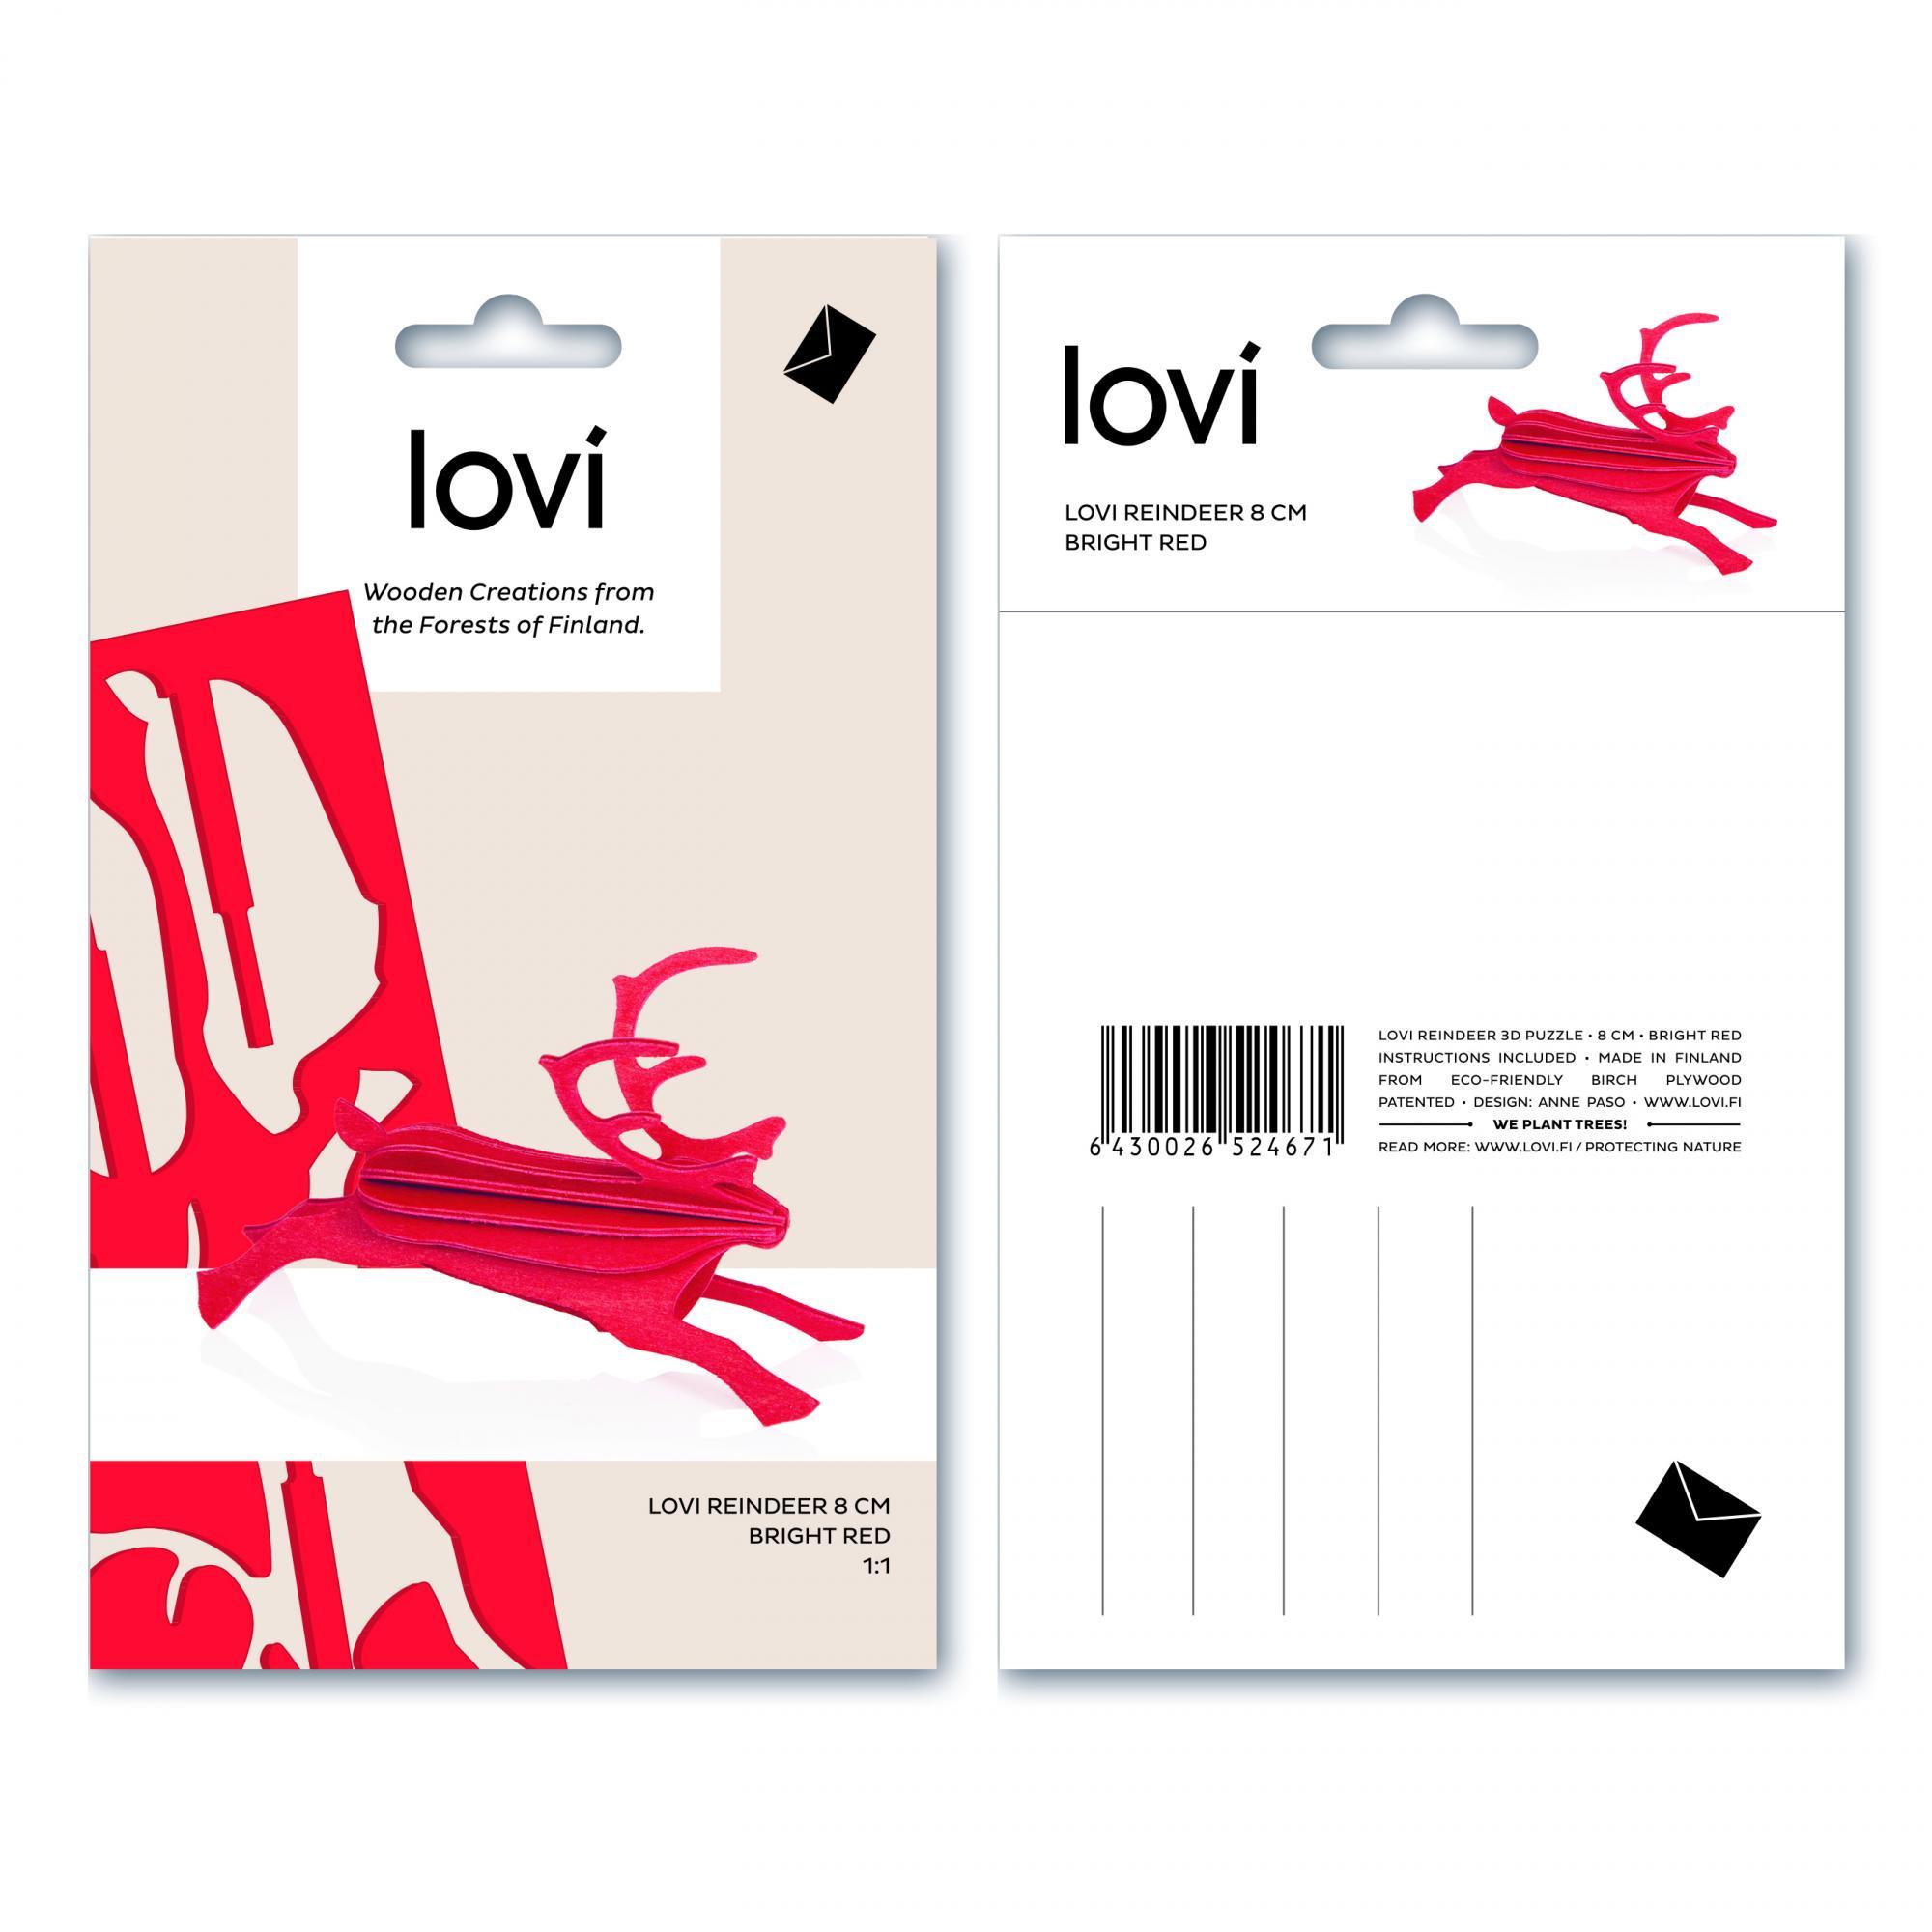 Lovi Bright Red Reindeer Construction Kit